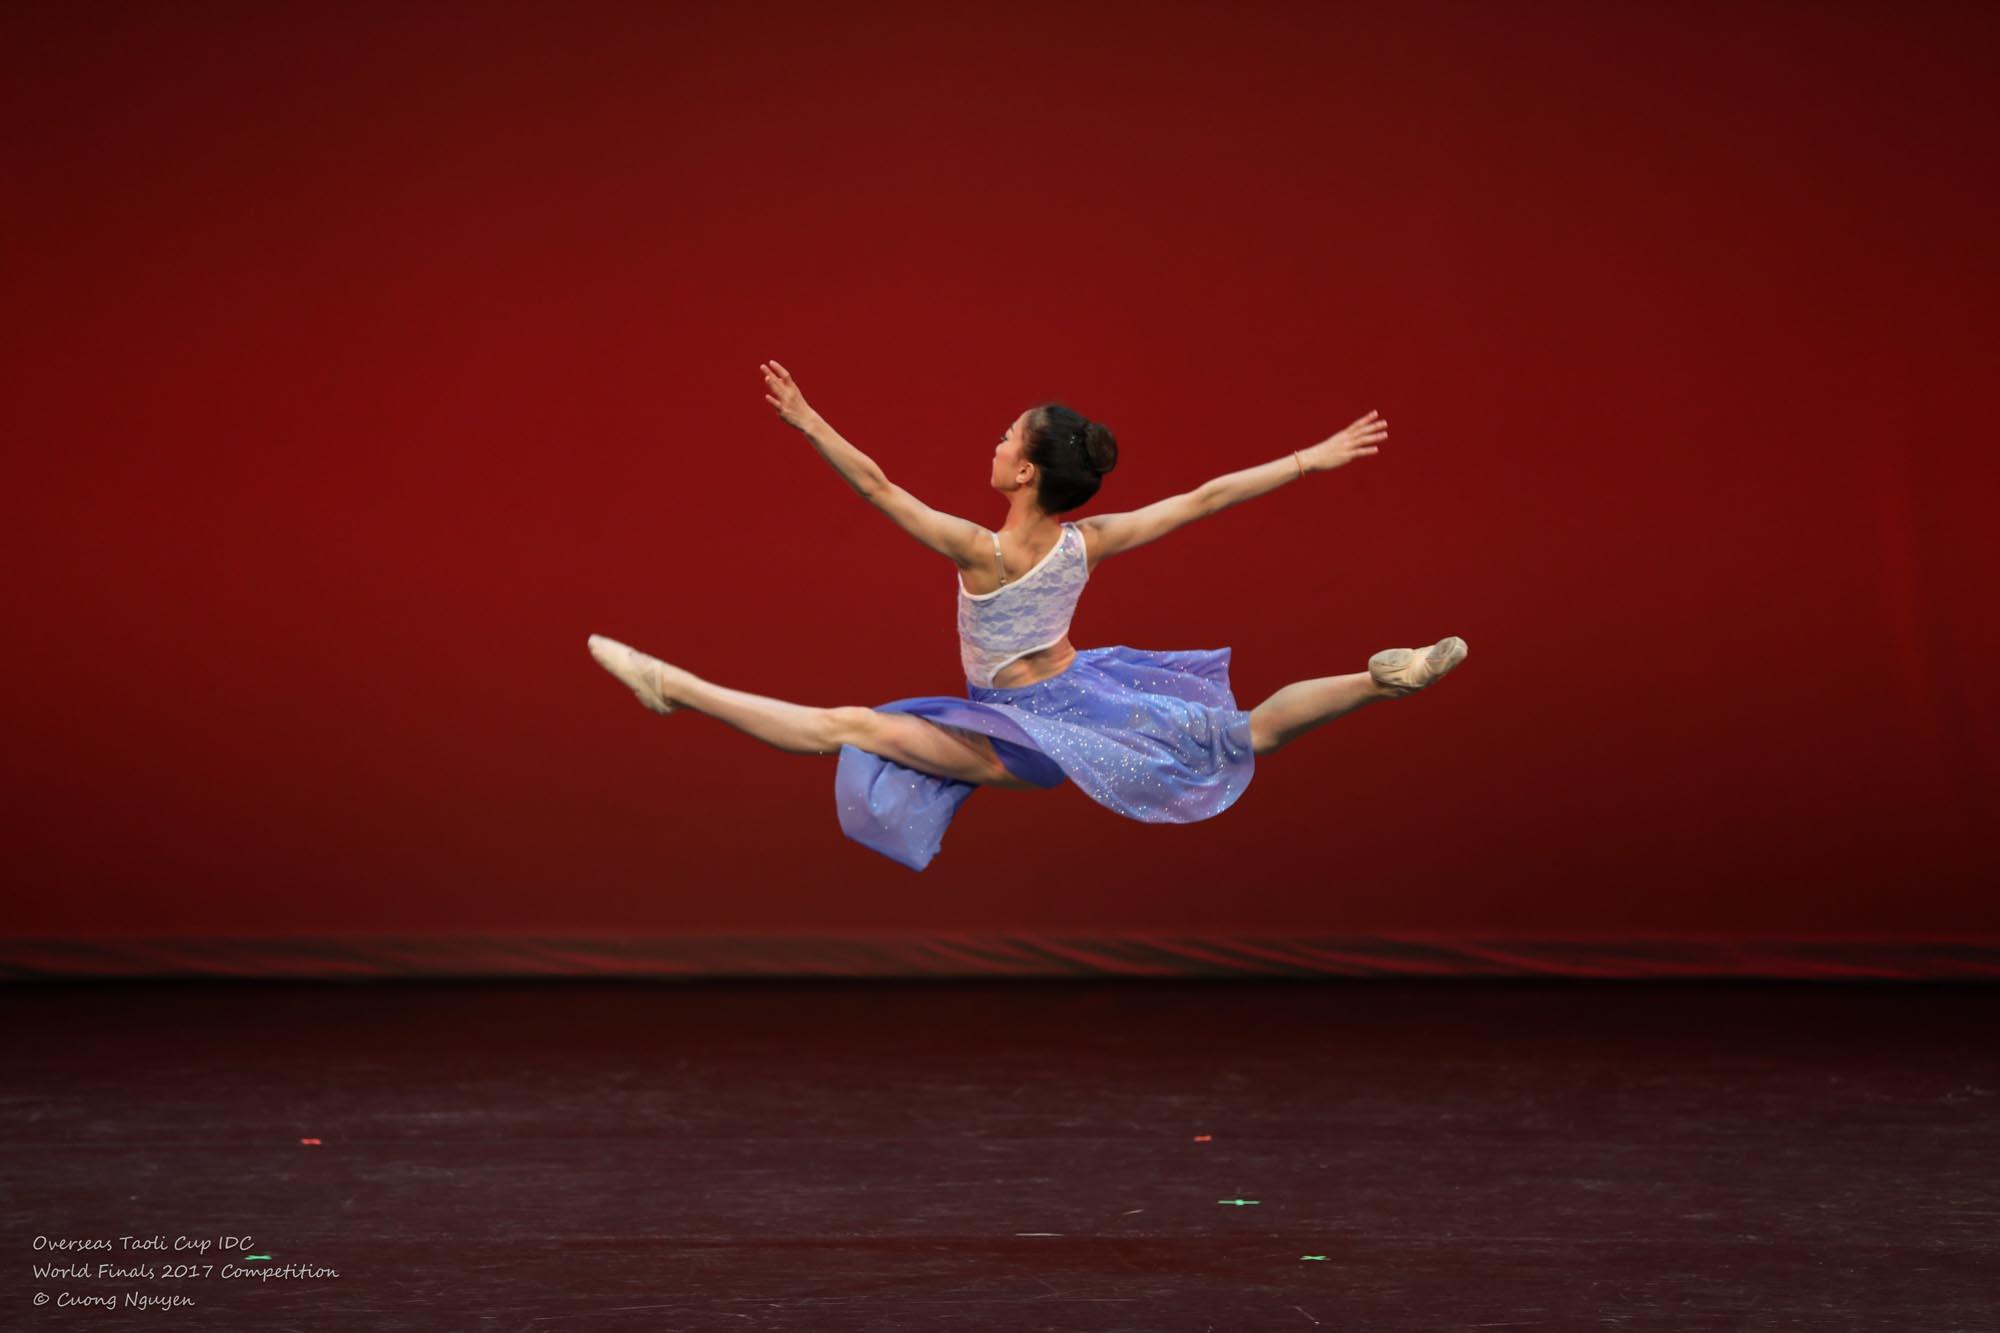 Chasing the Dream Jenna Zhao